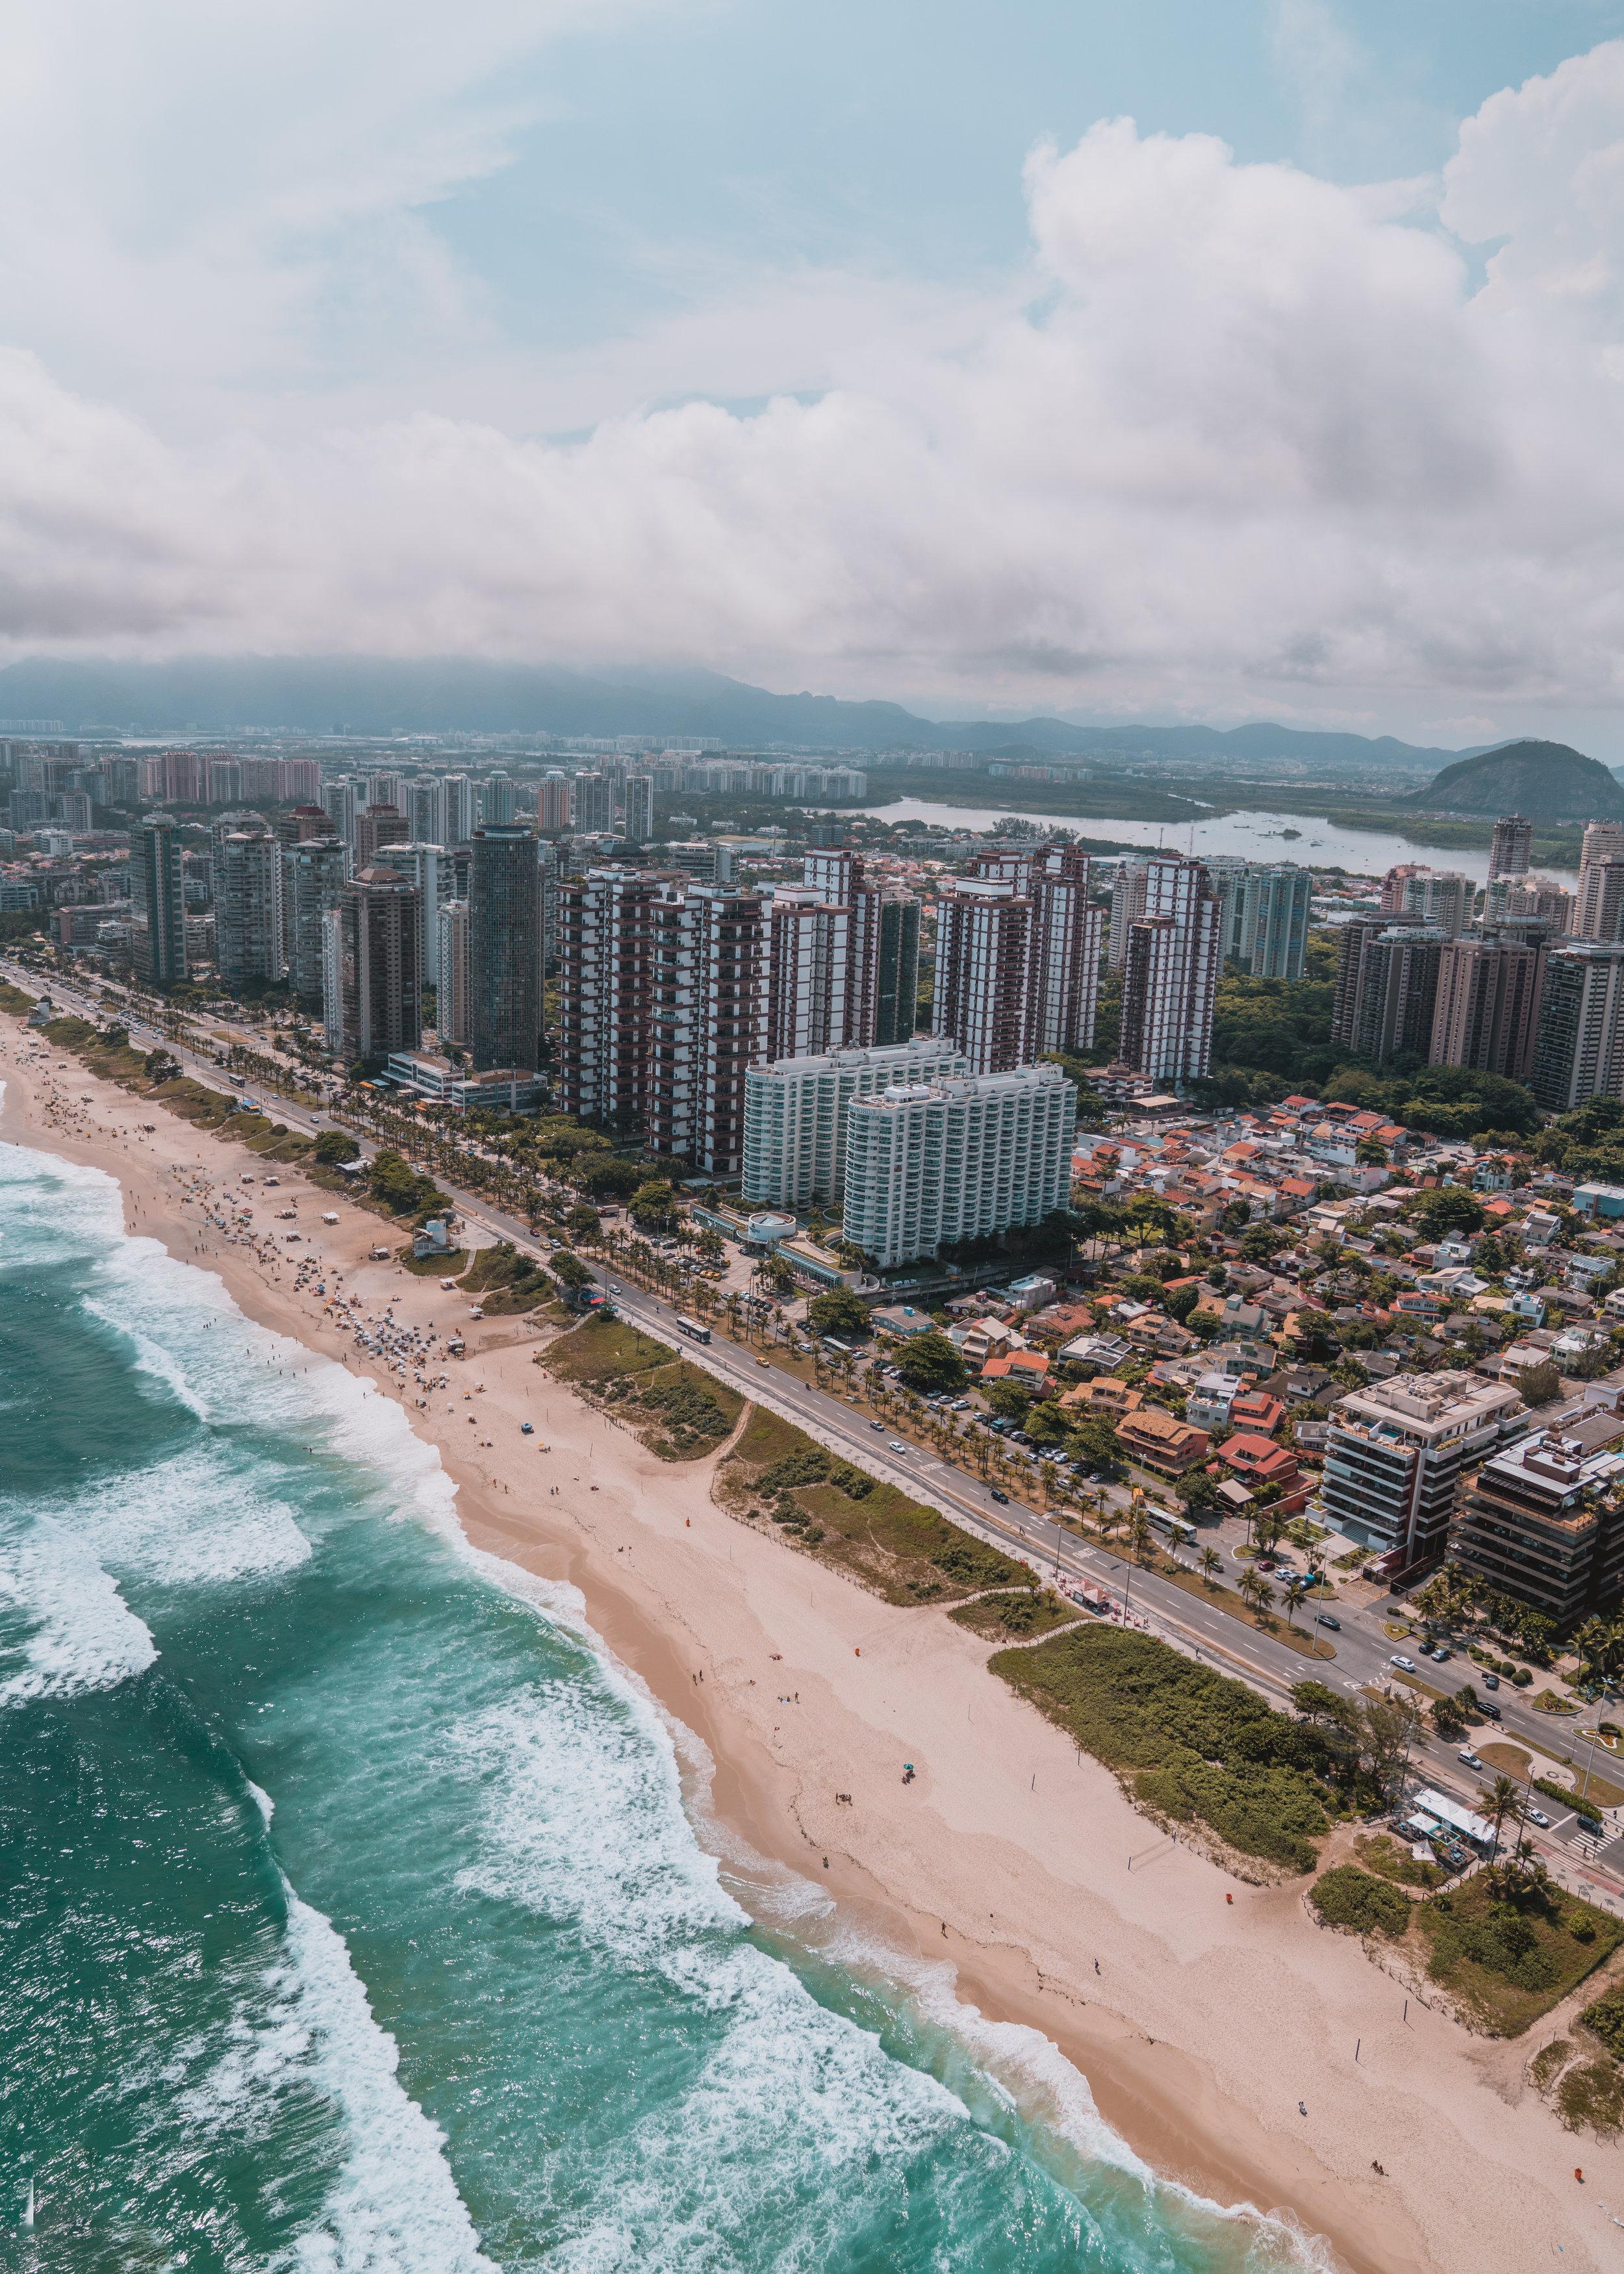 DOORS-OFF HELICOPTER PHOTO EXPERIENCE OVER RIO DE JANEIRO, BRAZIL